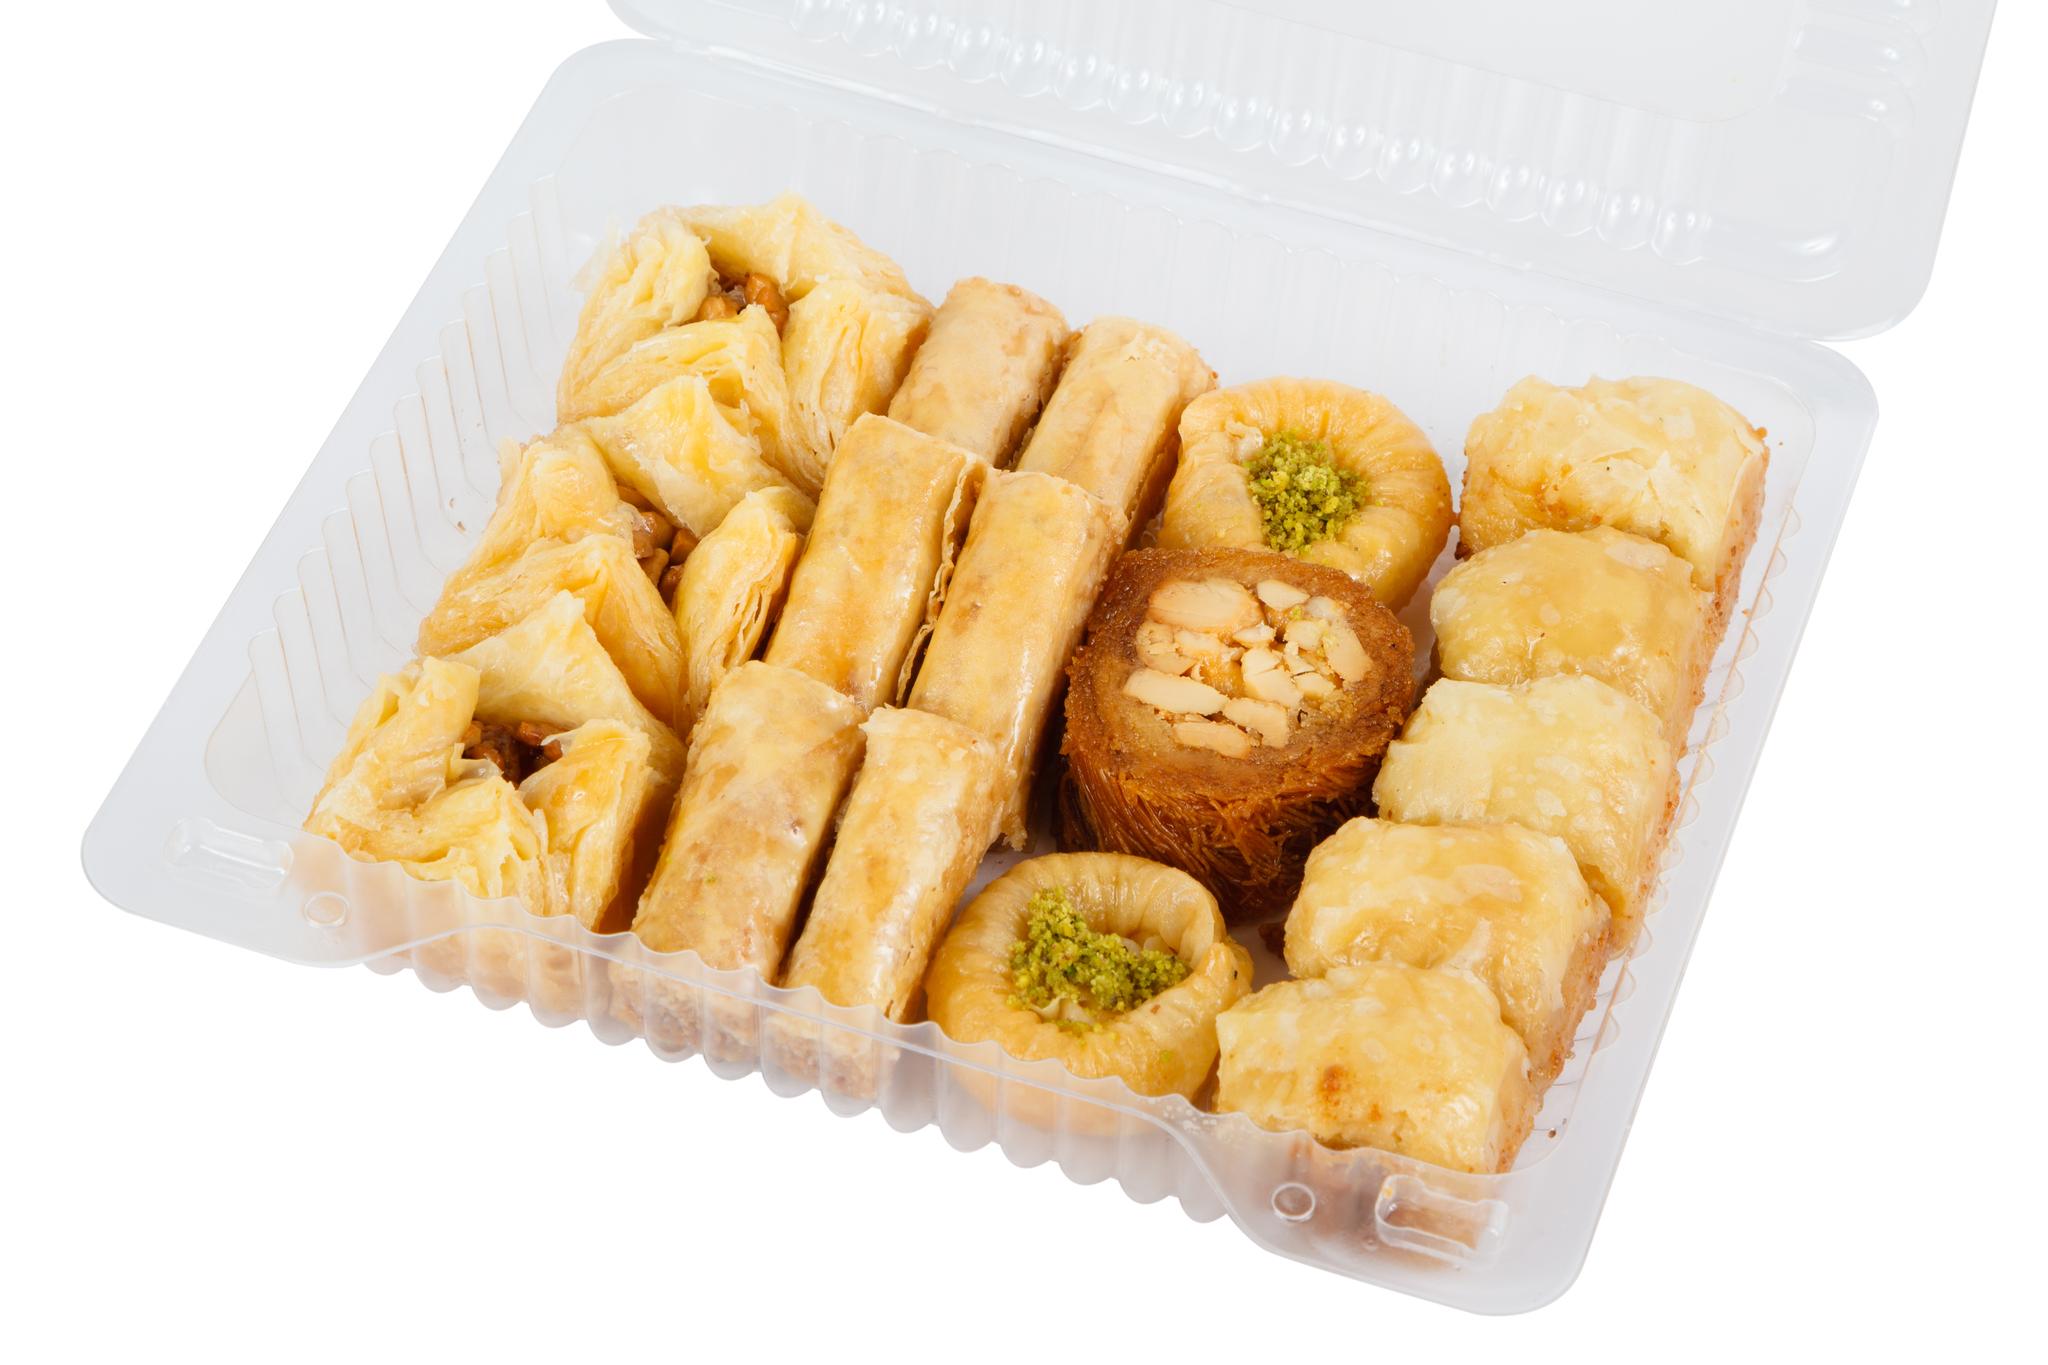 "Pate D'or Пахлава - Ассорти ливанских сладостей ""Акко"", 250 г import_files_6f_6f5dd357787e11e799f3606c664b1de1_226777efae6c11e7b011fcaa1488e48f.jpg"